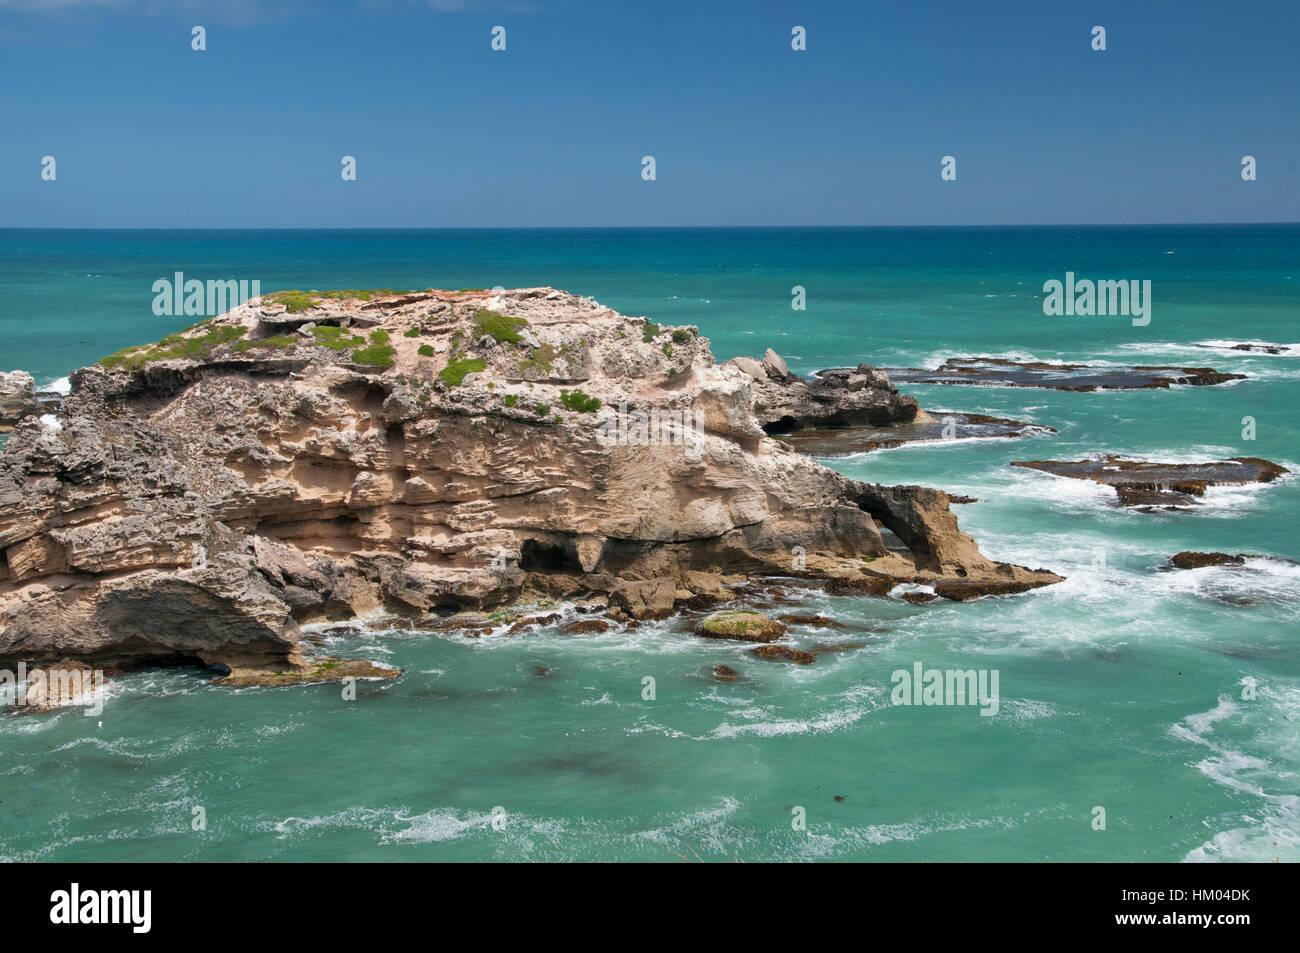 Coastal landforms at Cape Northumberland, Port MacDonnell, southeast South Australia - Stock Image